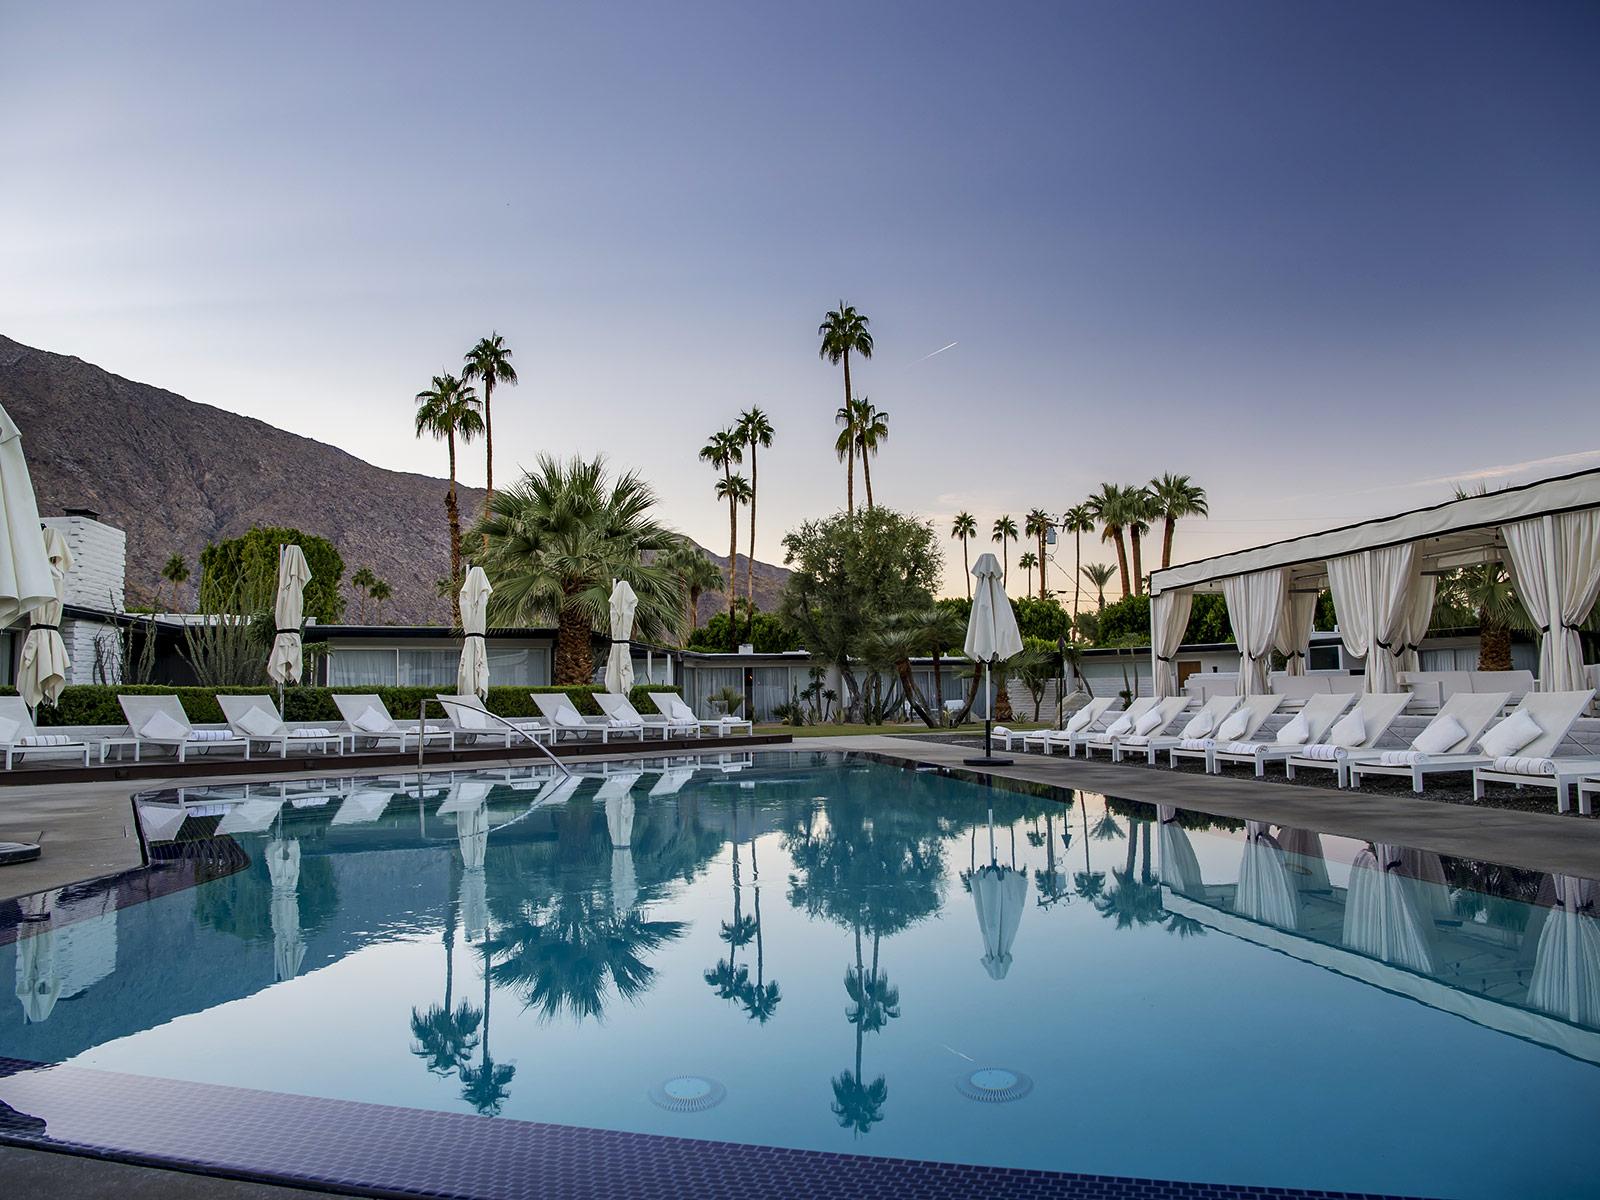 Image courtesy of L'Horizon Resort & Spa.